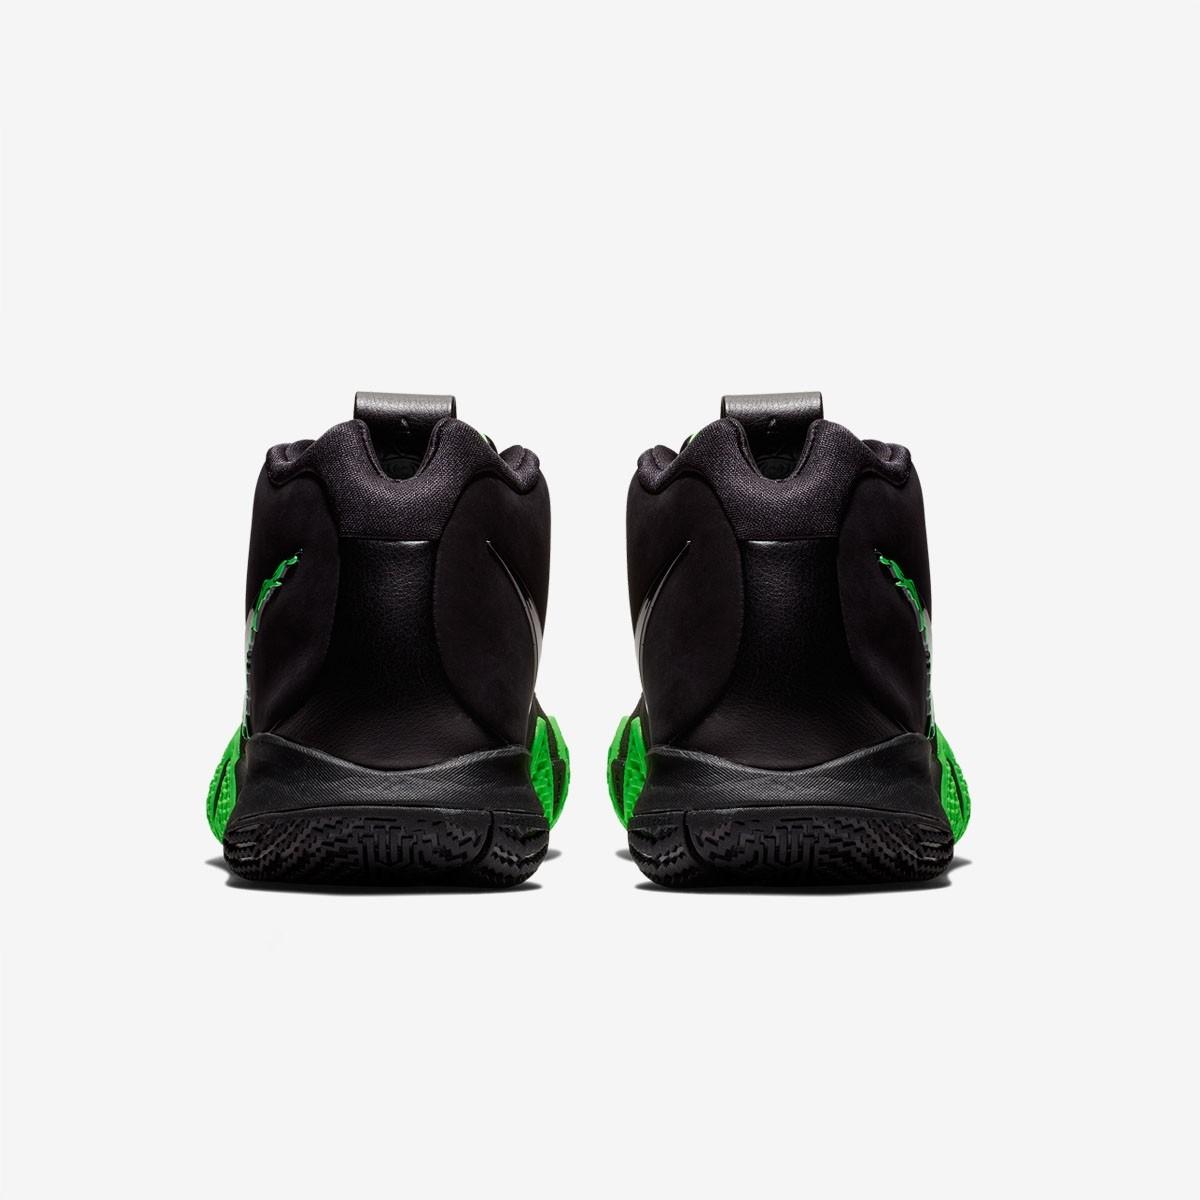 Nike Kyrie 4 'Halloween' 943806-012